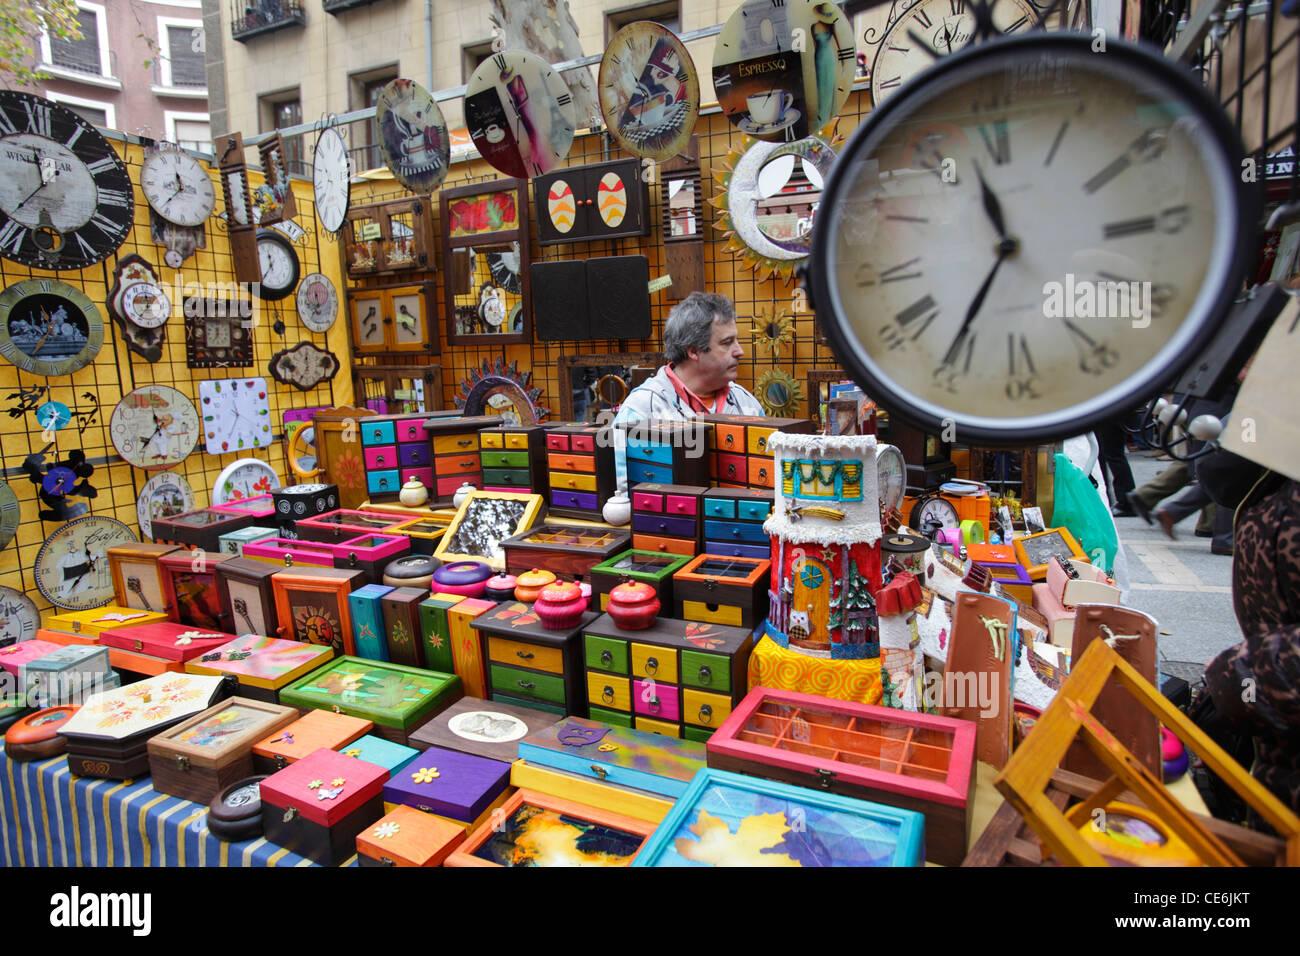 The market of El Rastro, Madrid, Spain - Stock Image